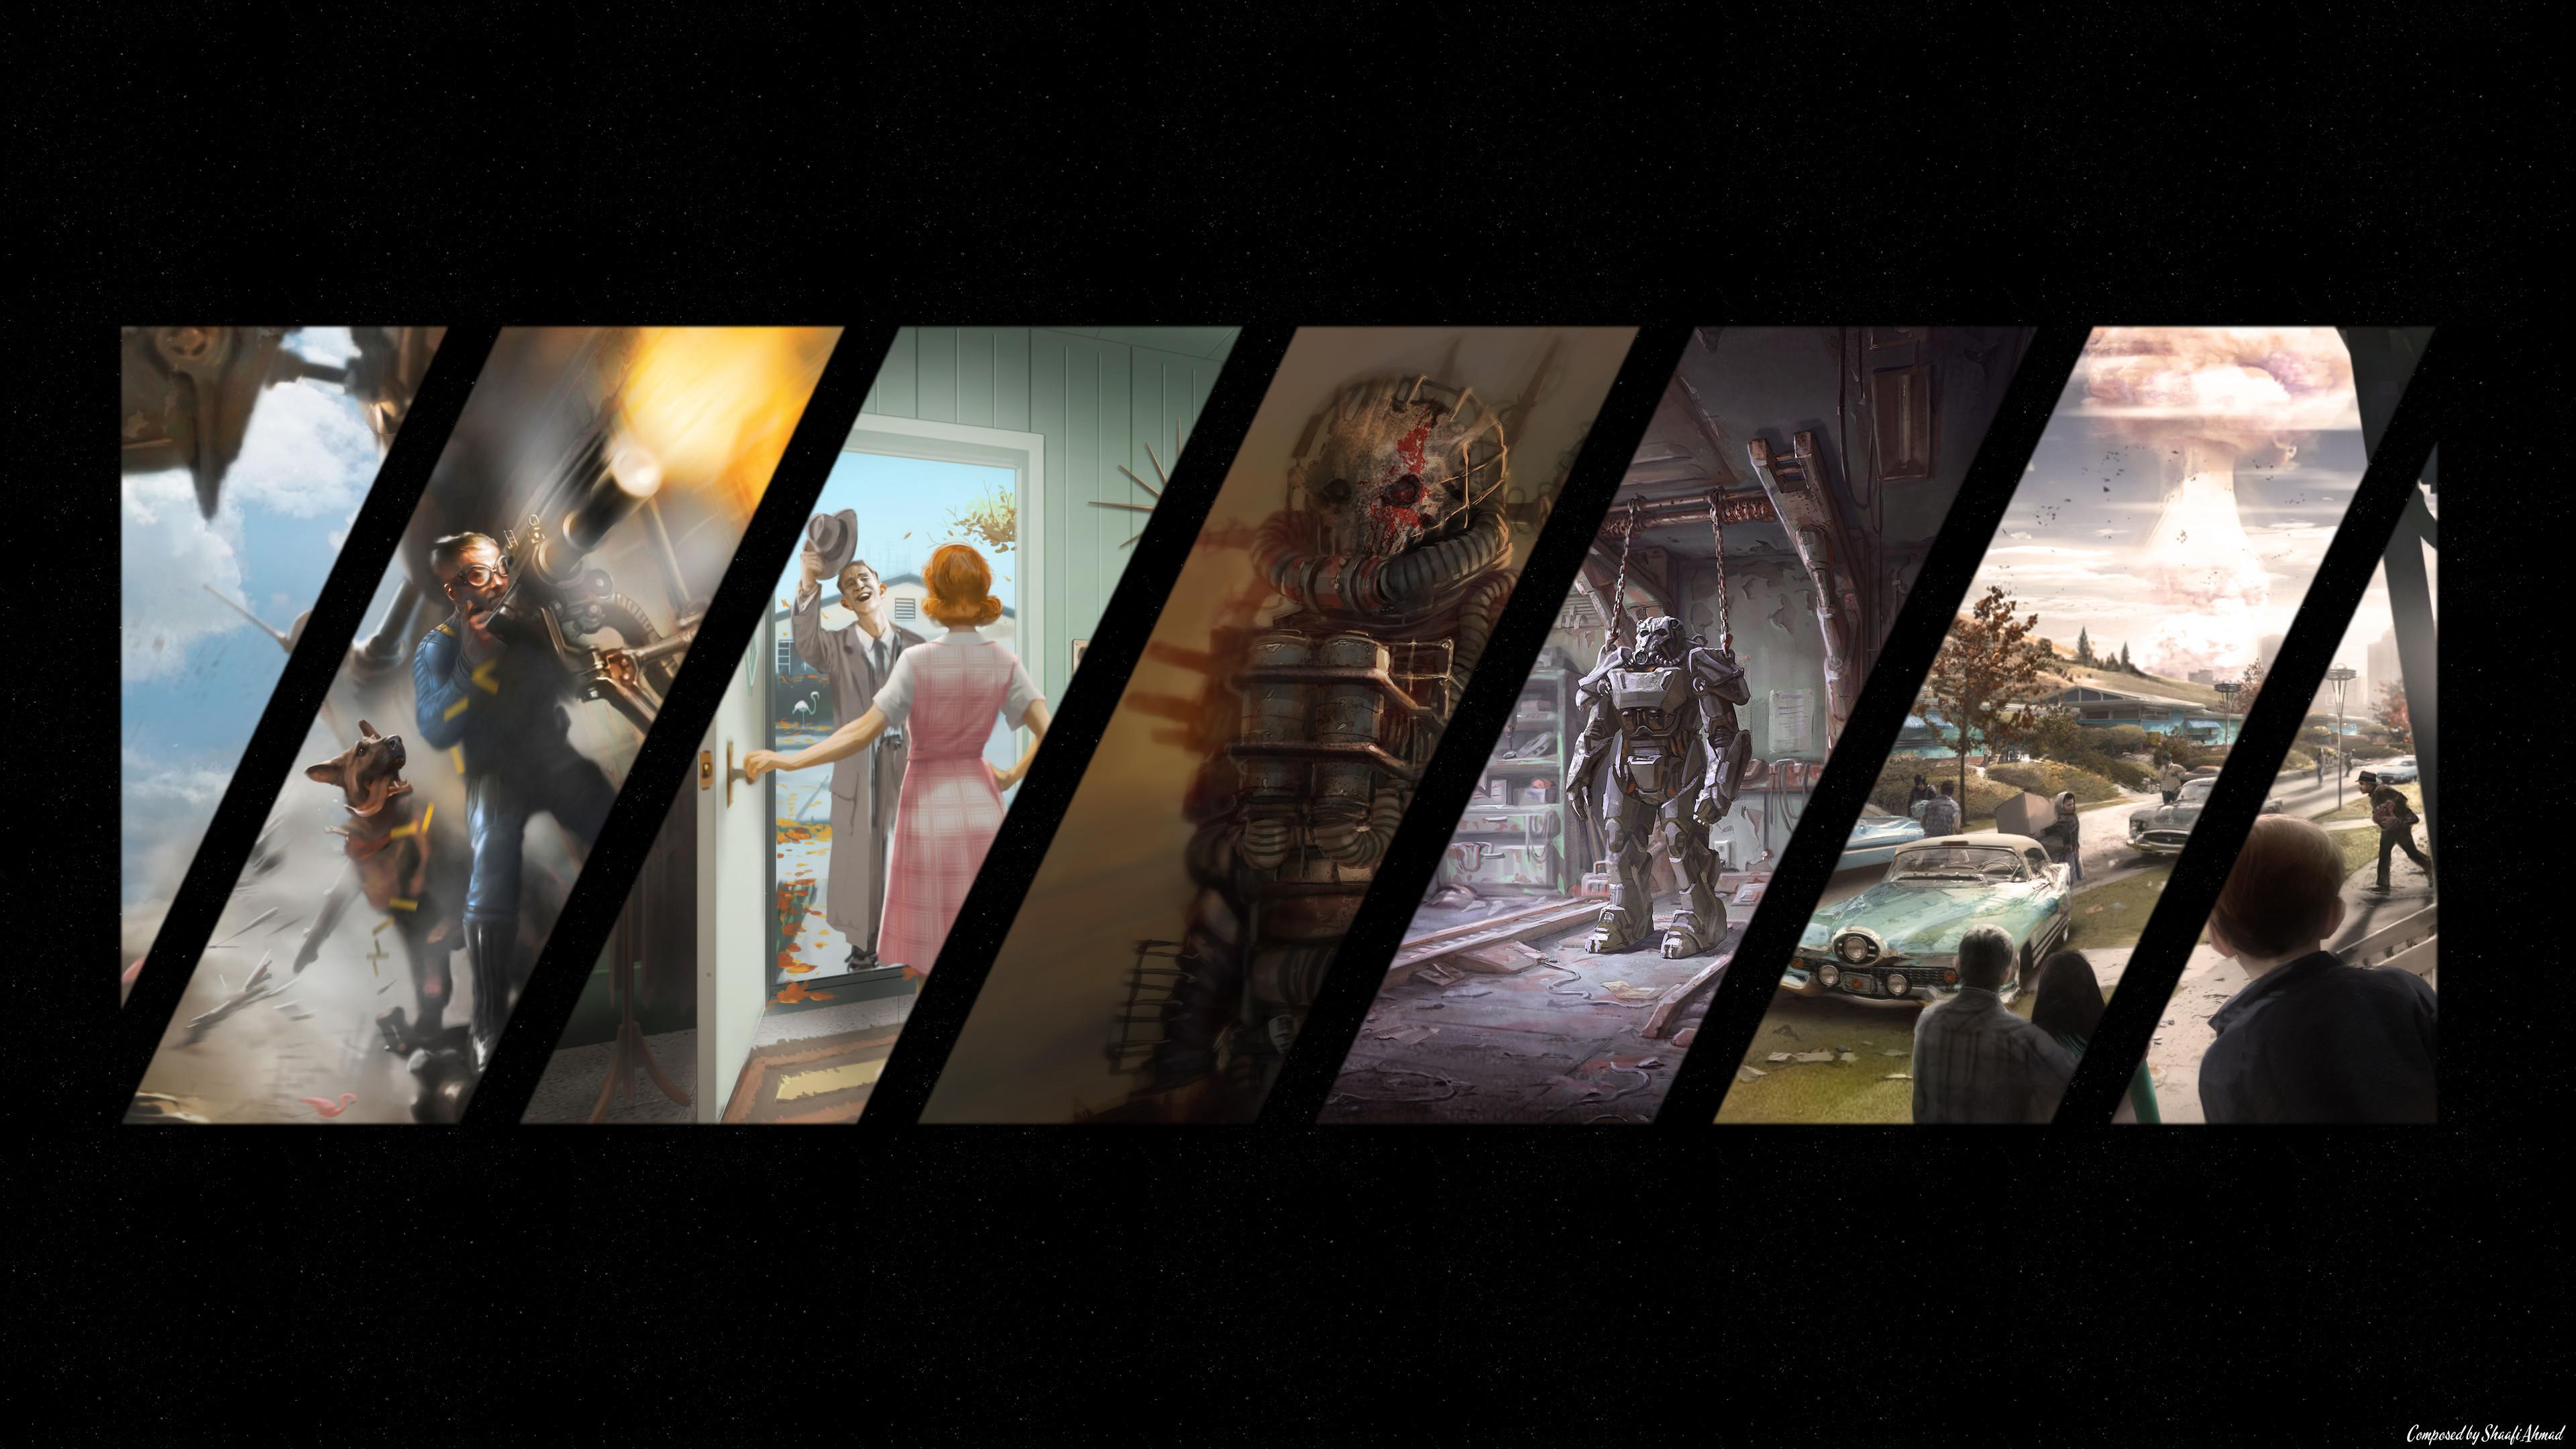 Fallout 4 Wallpaper Phone Fallout 4 Wallpapers